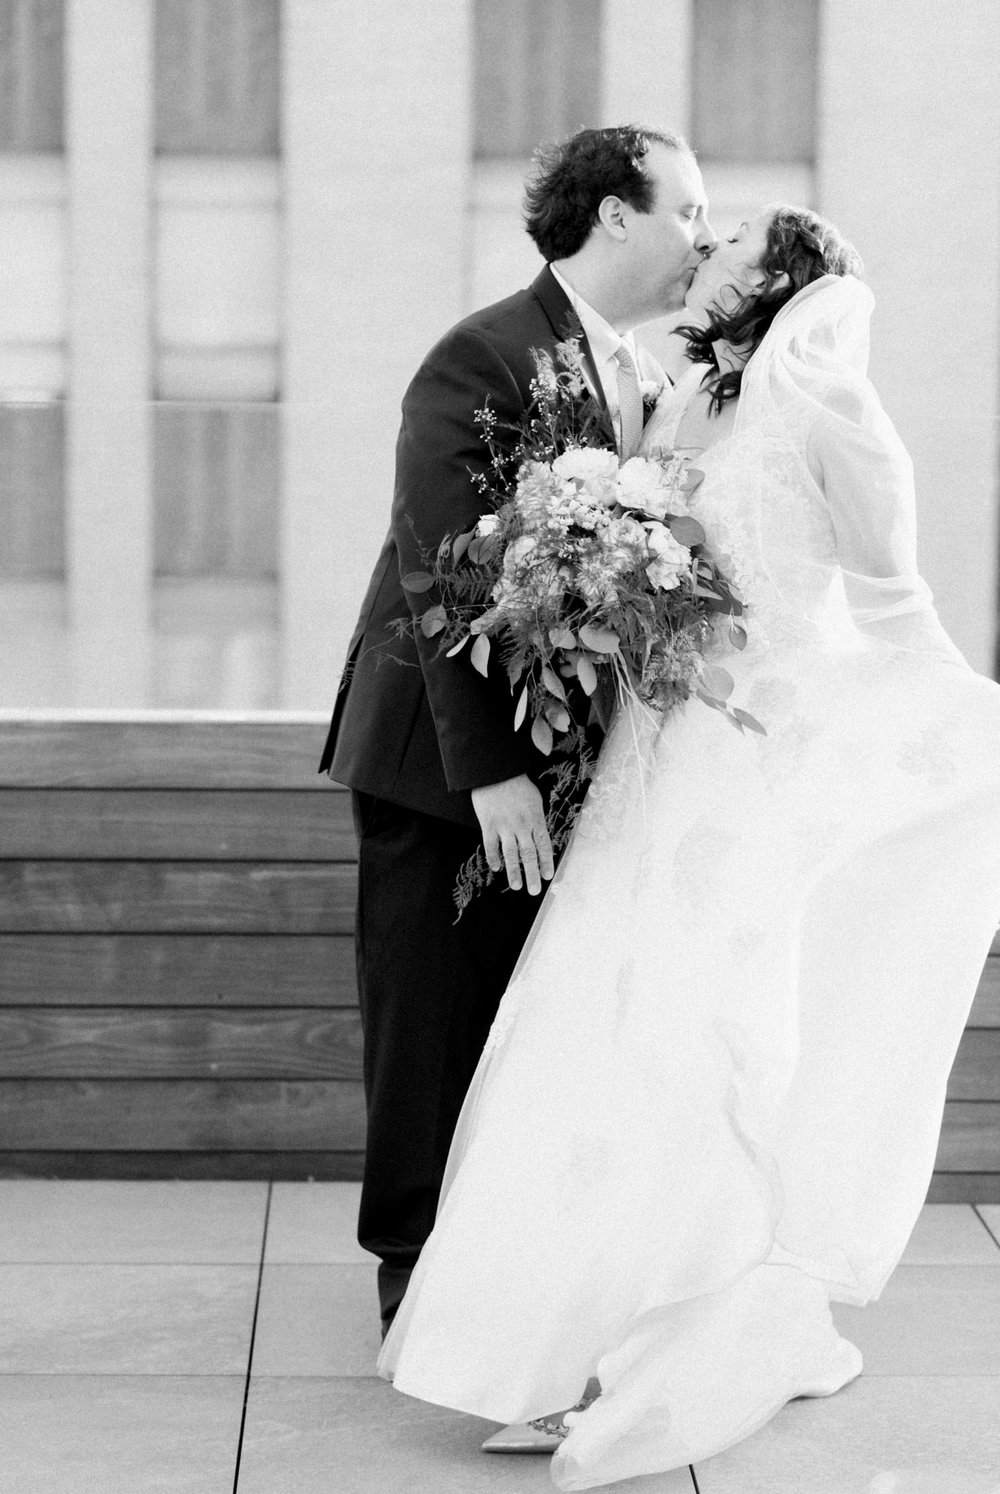 TheVirginianHotel_LynchburgVA_TheVirginianHotelWedding_Virginiaweddingphotographer_Lynchburgvawedding 44.jpg